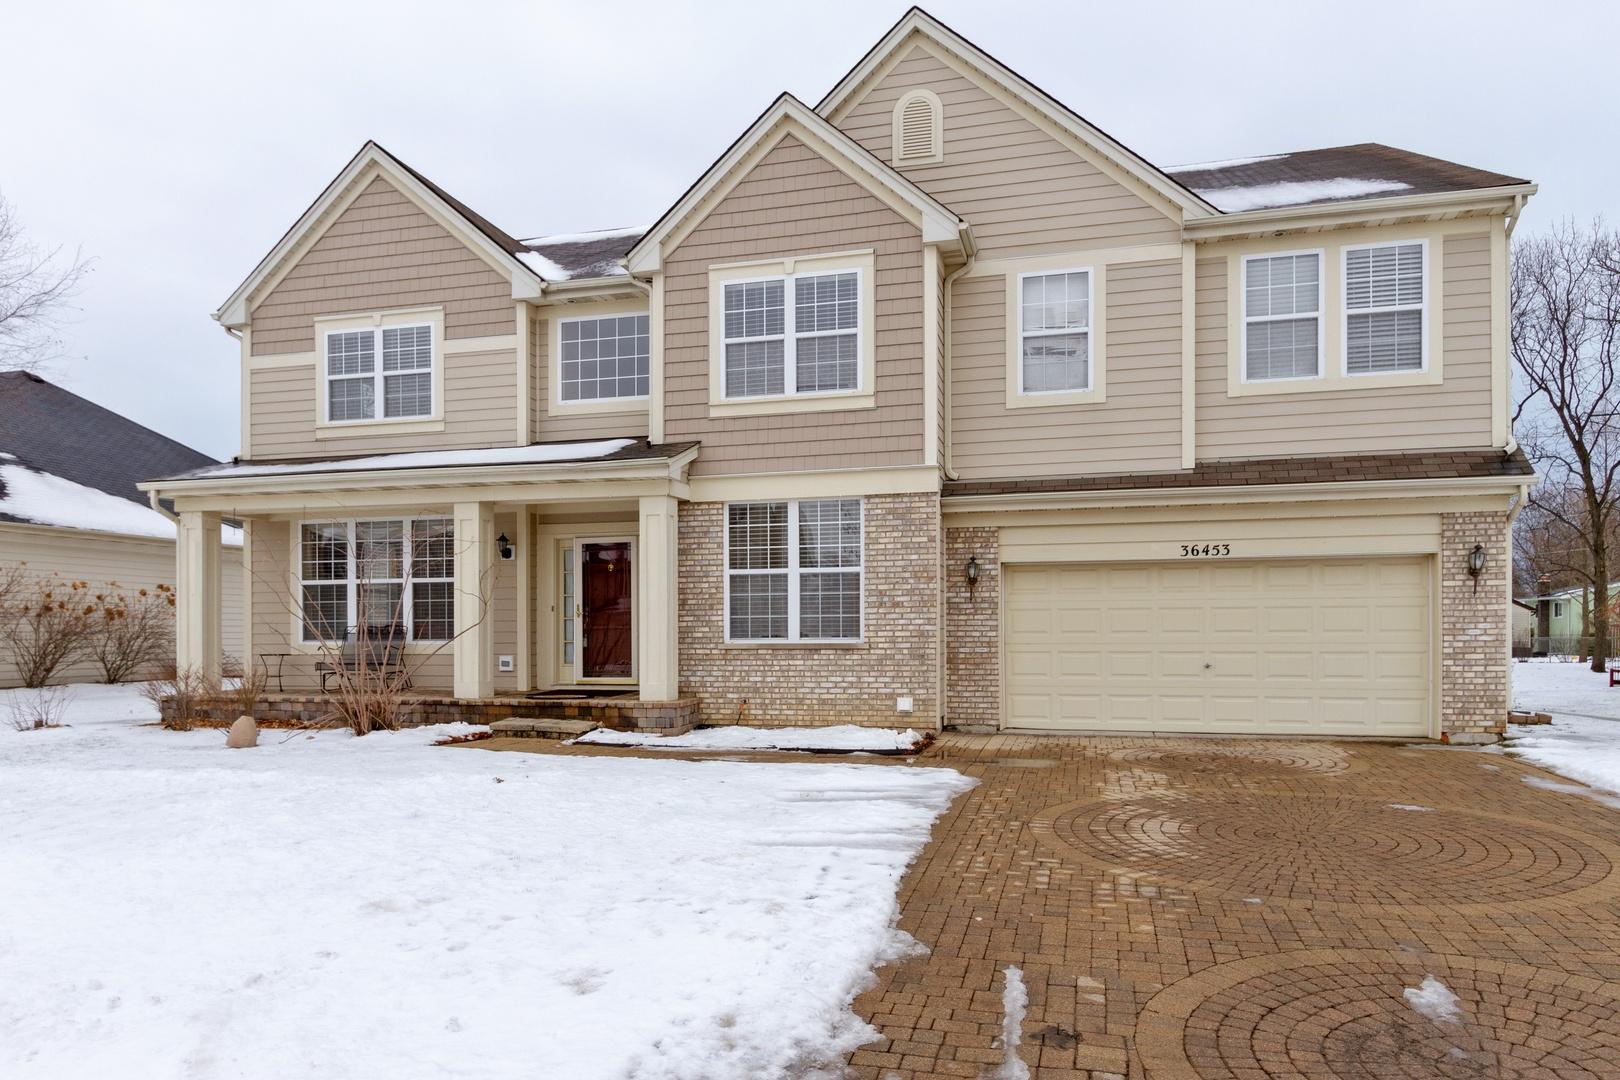 36453 North Yew Tree Drive, Lake Villa, Illinois 60046